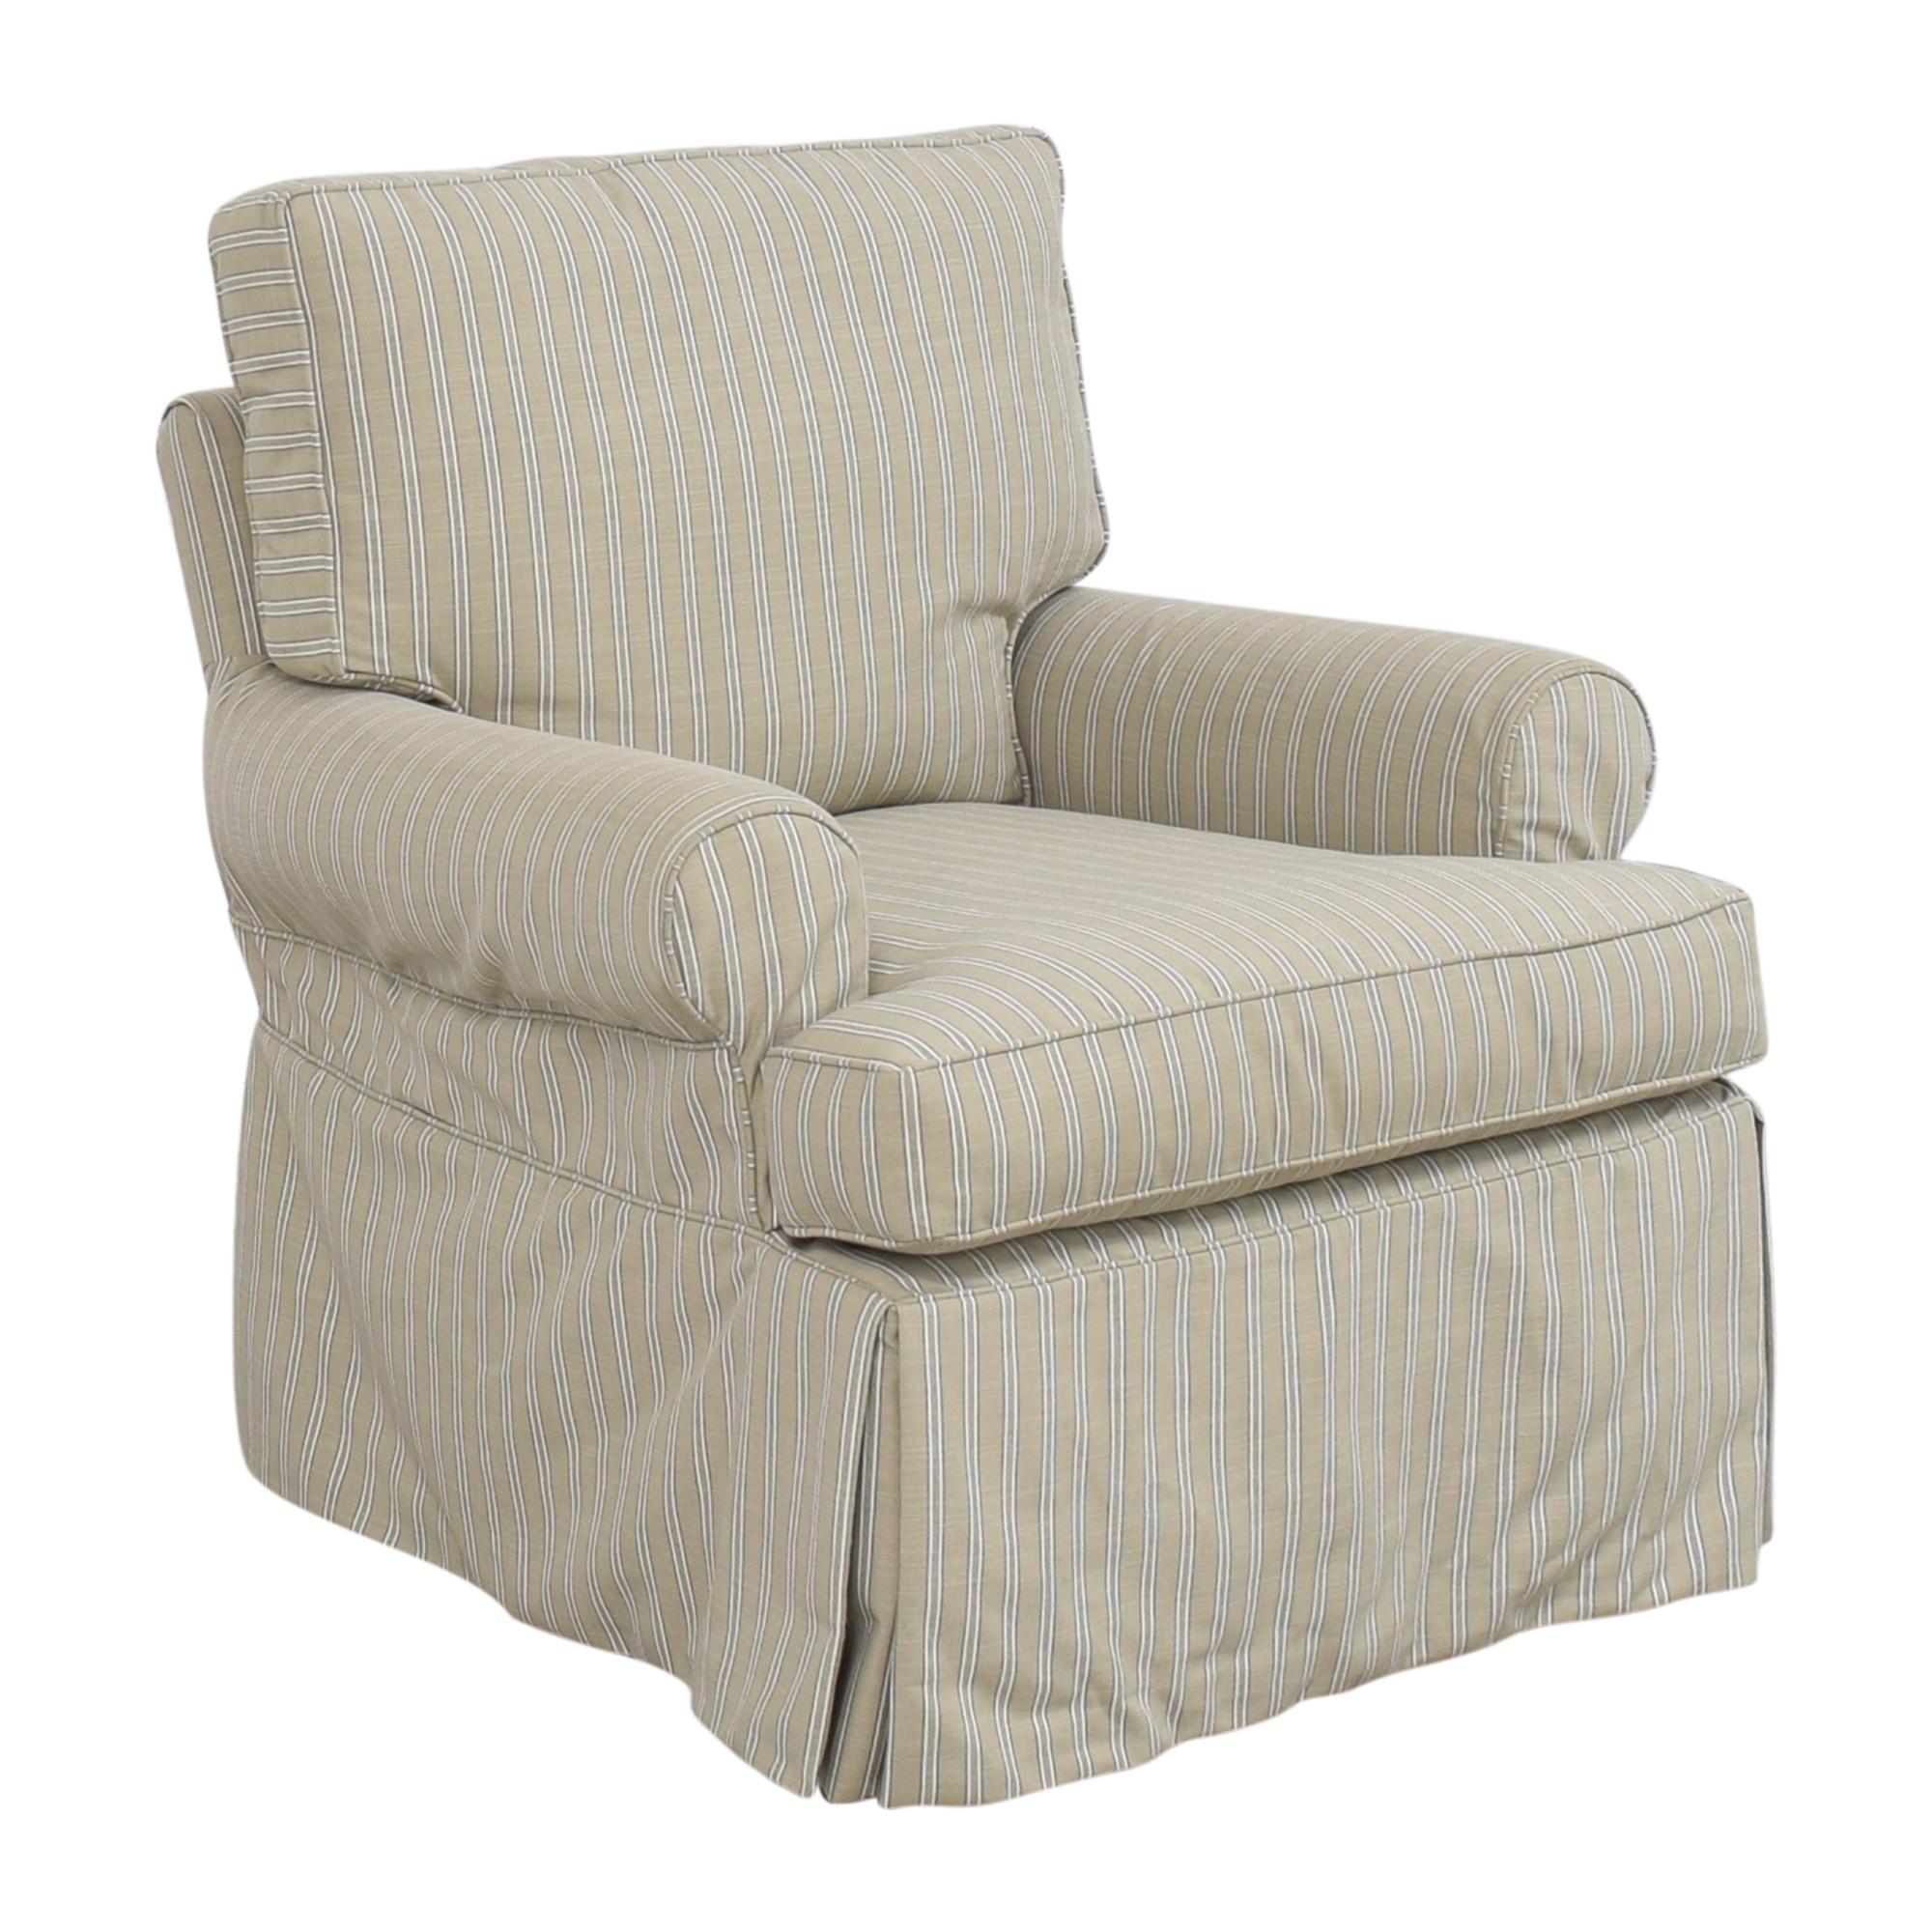 buy Restoration Hardware Skirted Glider  Restoration Hardware Accent Chairs